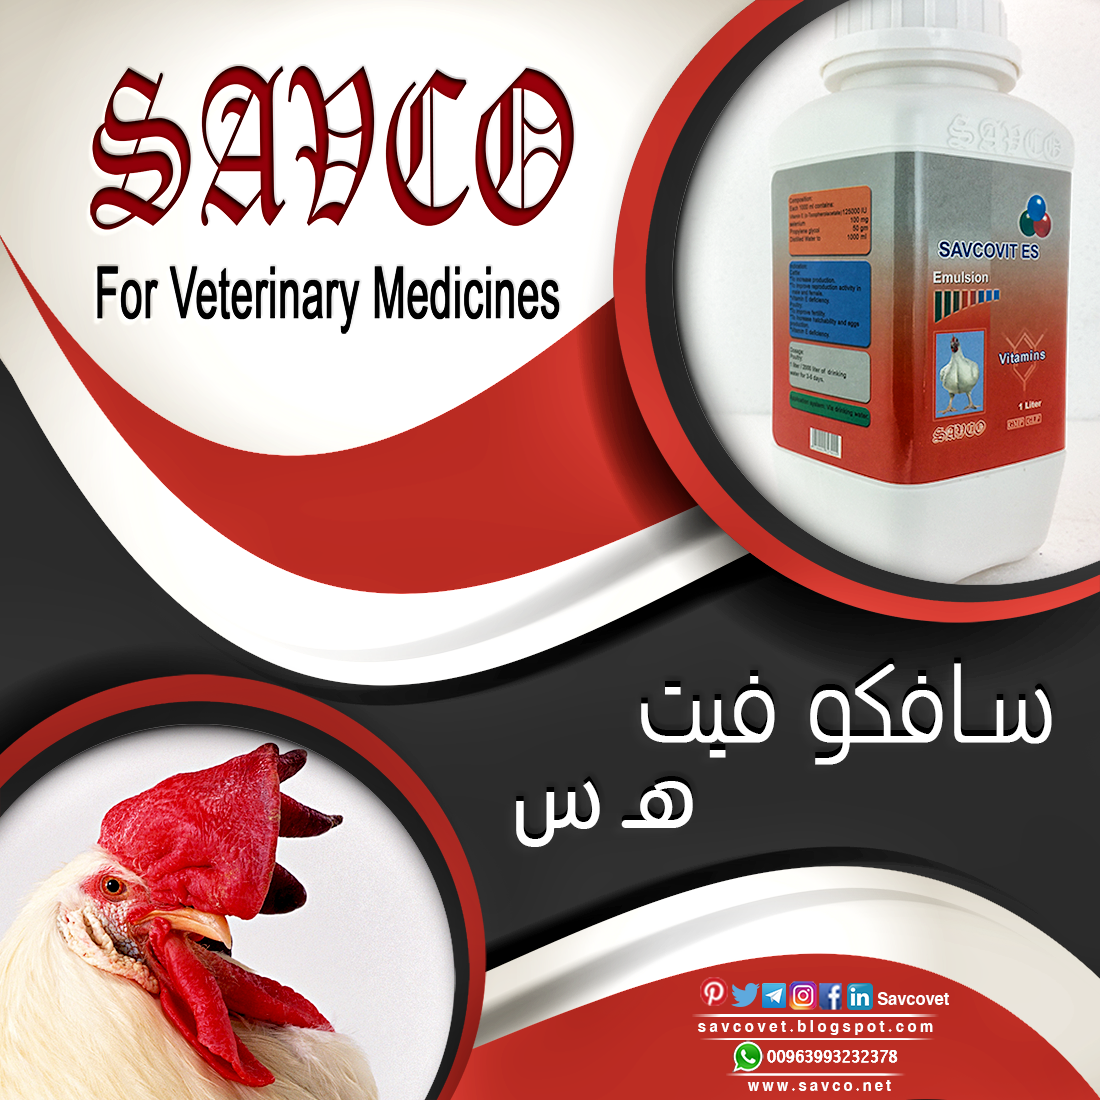 Pin By Savco For Veterinary Medicines On منتجات وأصناف دوائية Mycoplasma The Cure Medicine